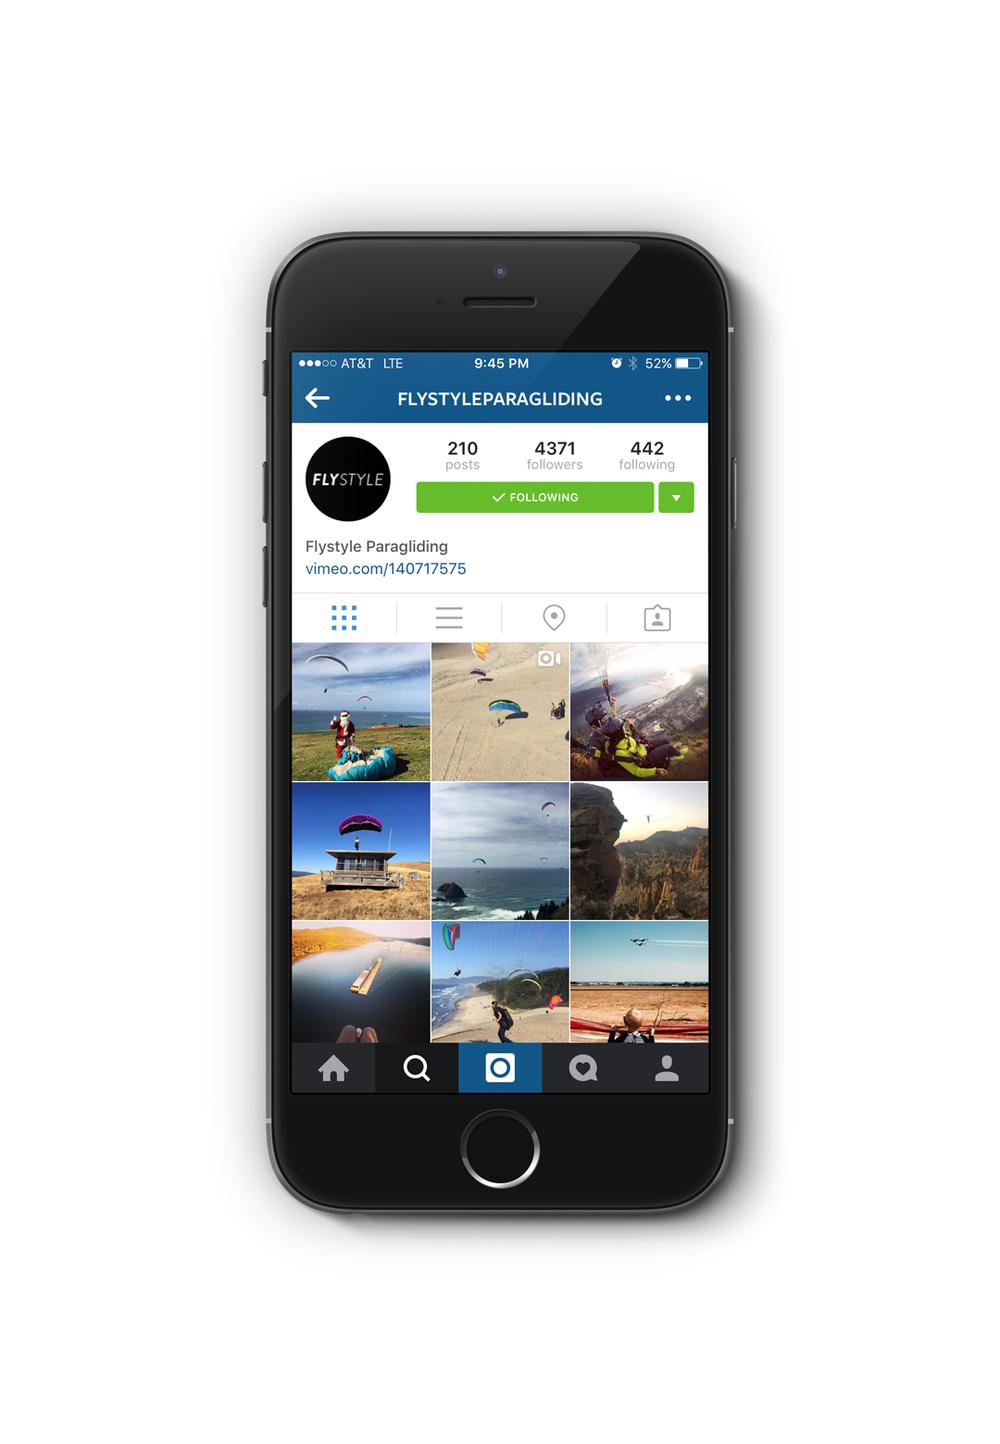 Flystyle-Insta_iPhone6_mockup.jpg